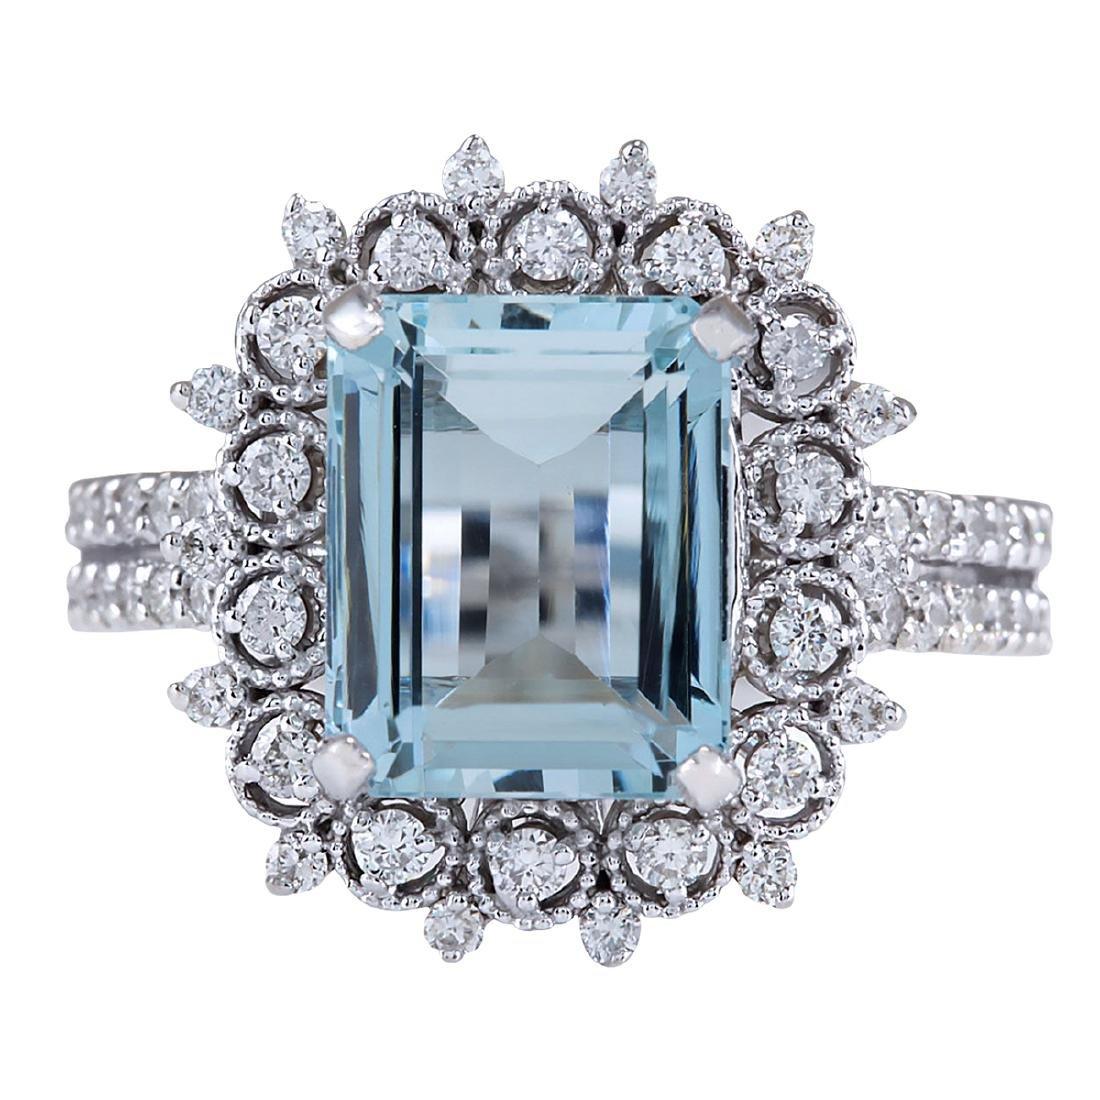 4.15CTW Natural Aquamarine And Diamond Ring In 18K